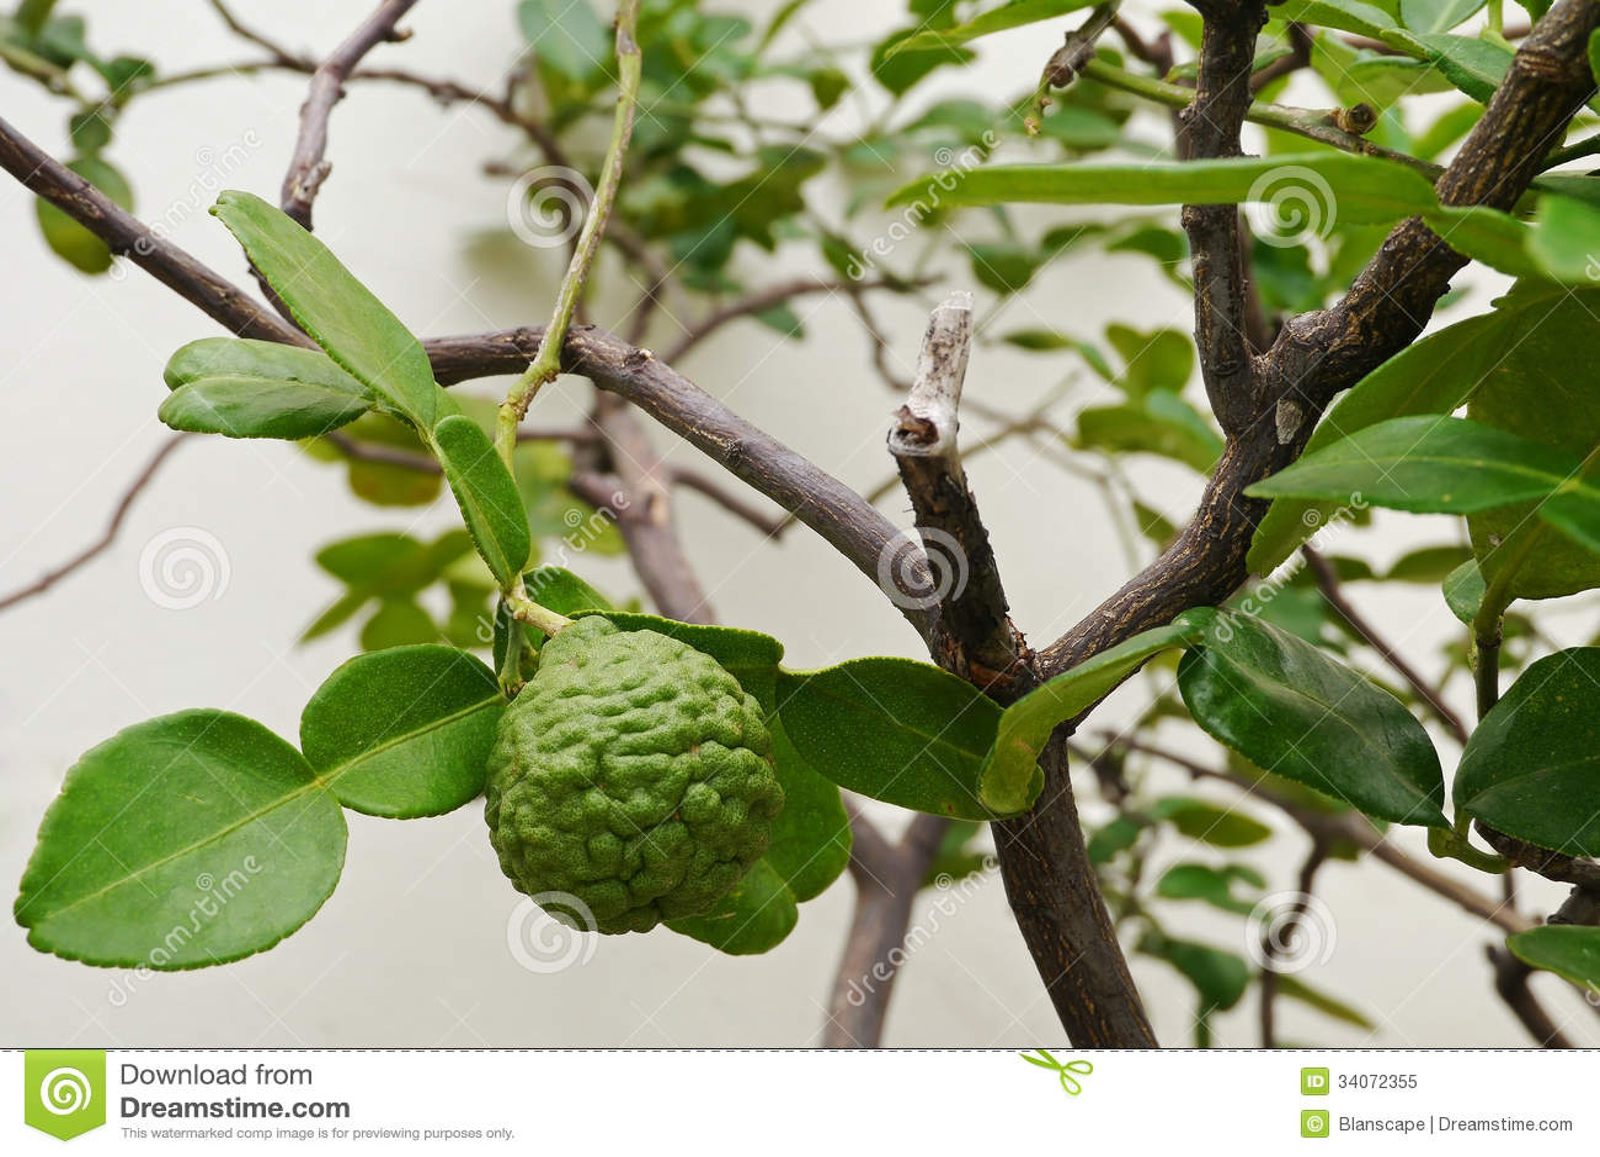 Leech Lime Or Bergamot Fruits On Tree Stock Image - Image ... Leeches Fruit Tree